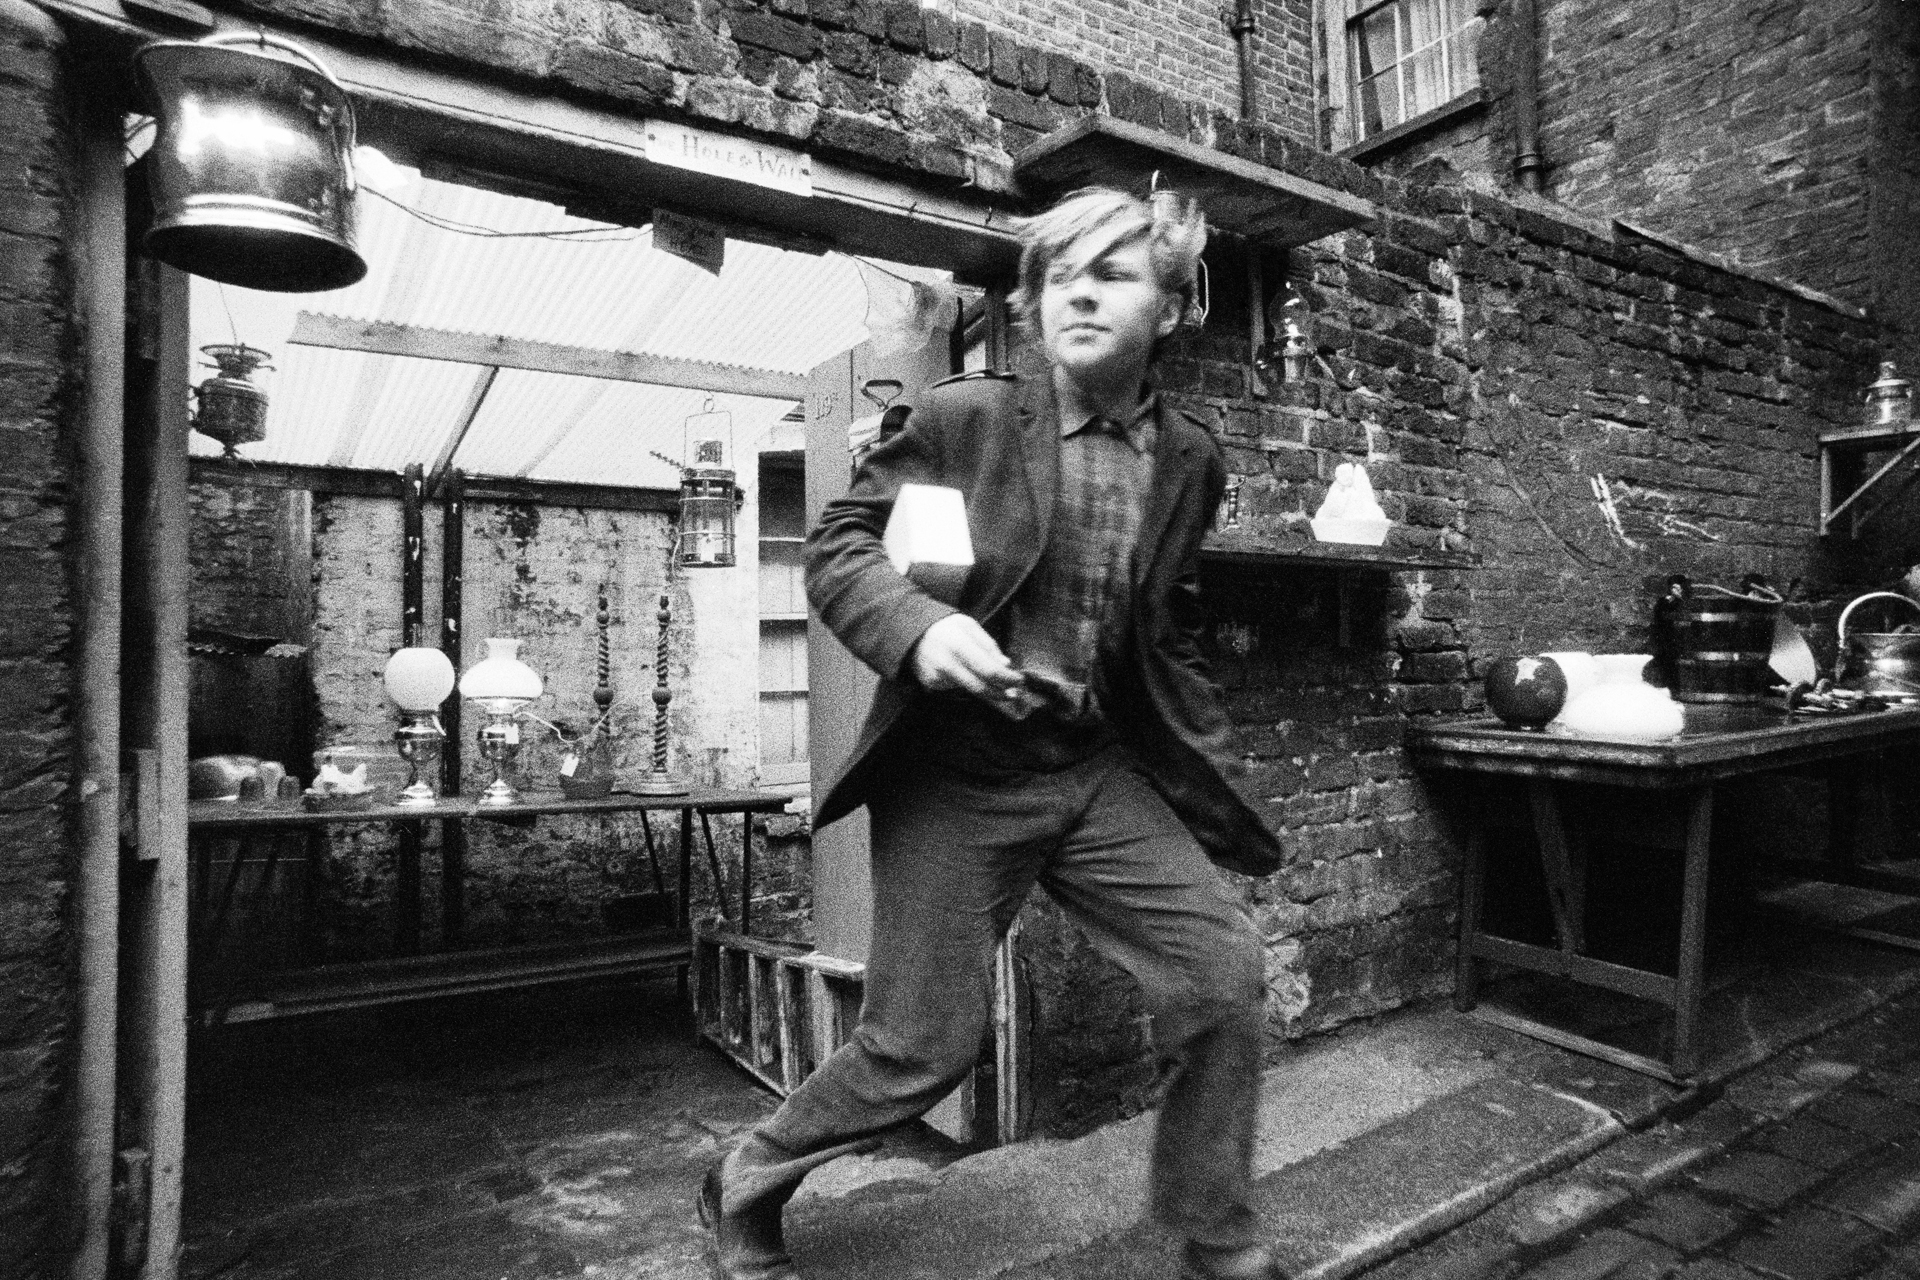 Londres, Inglaterra,1970.Negativo blanco y negro 35 mm